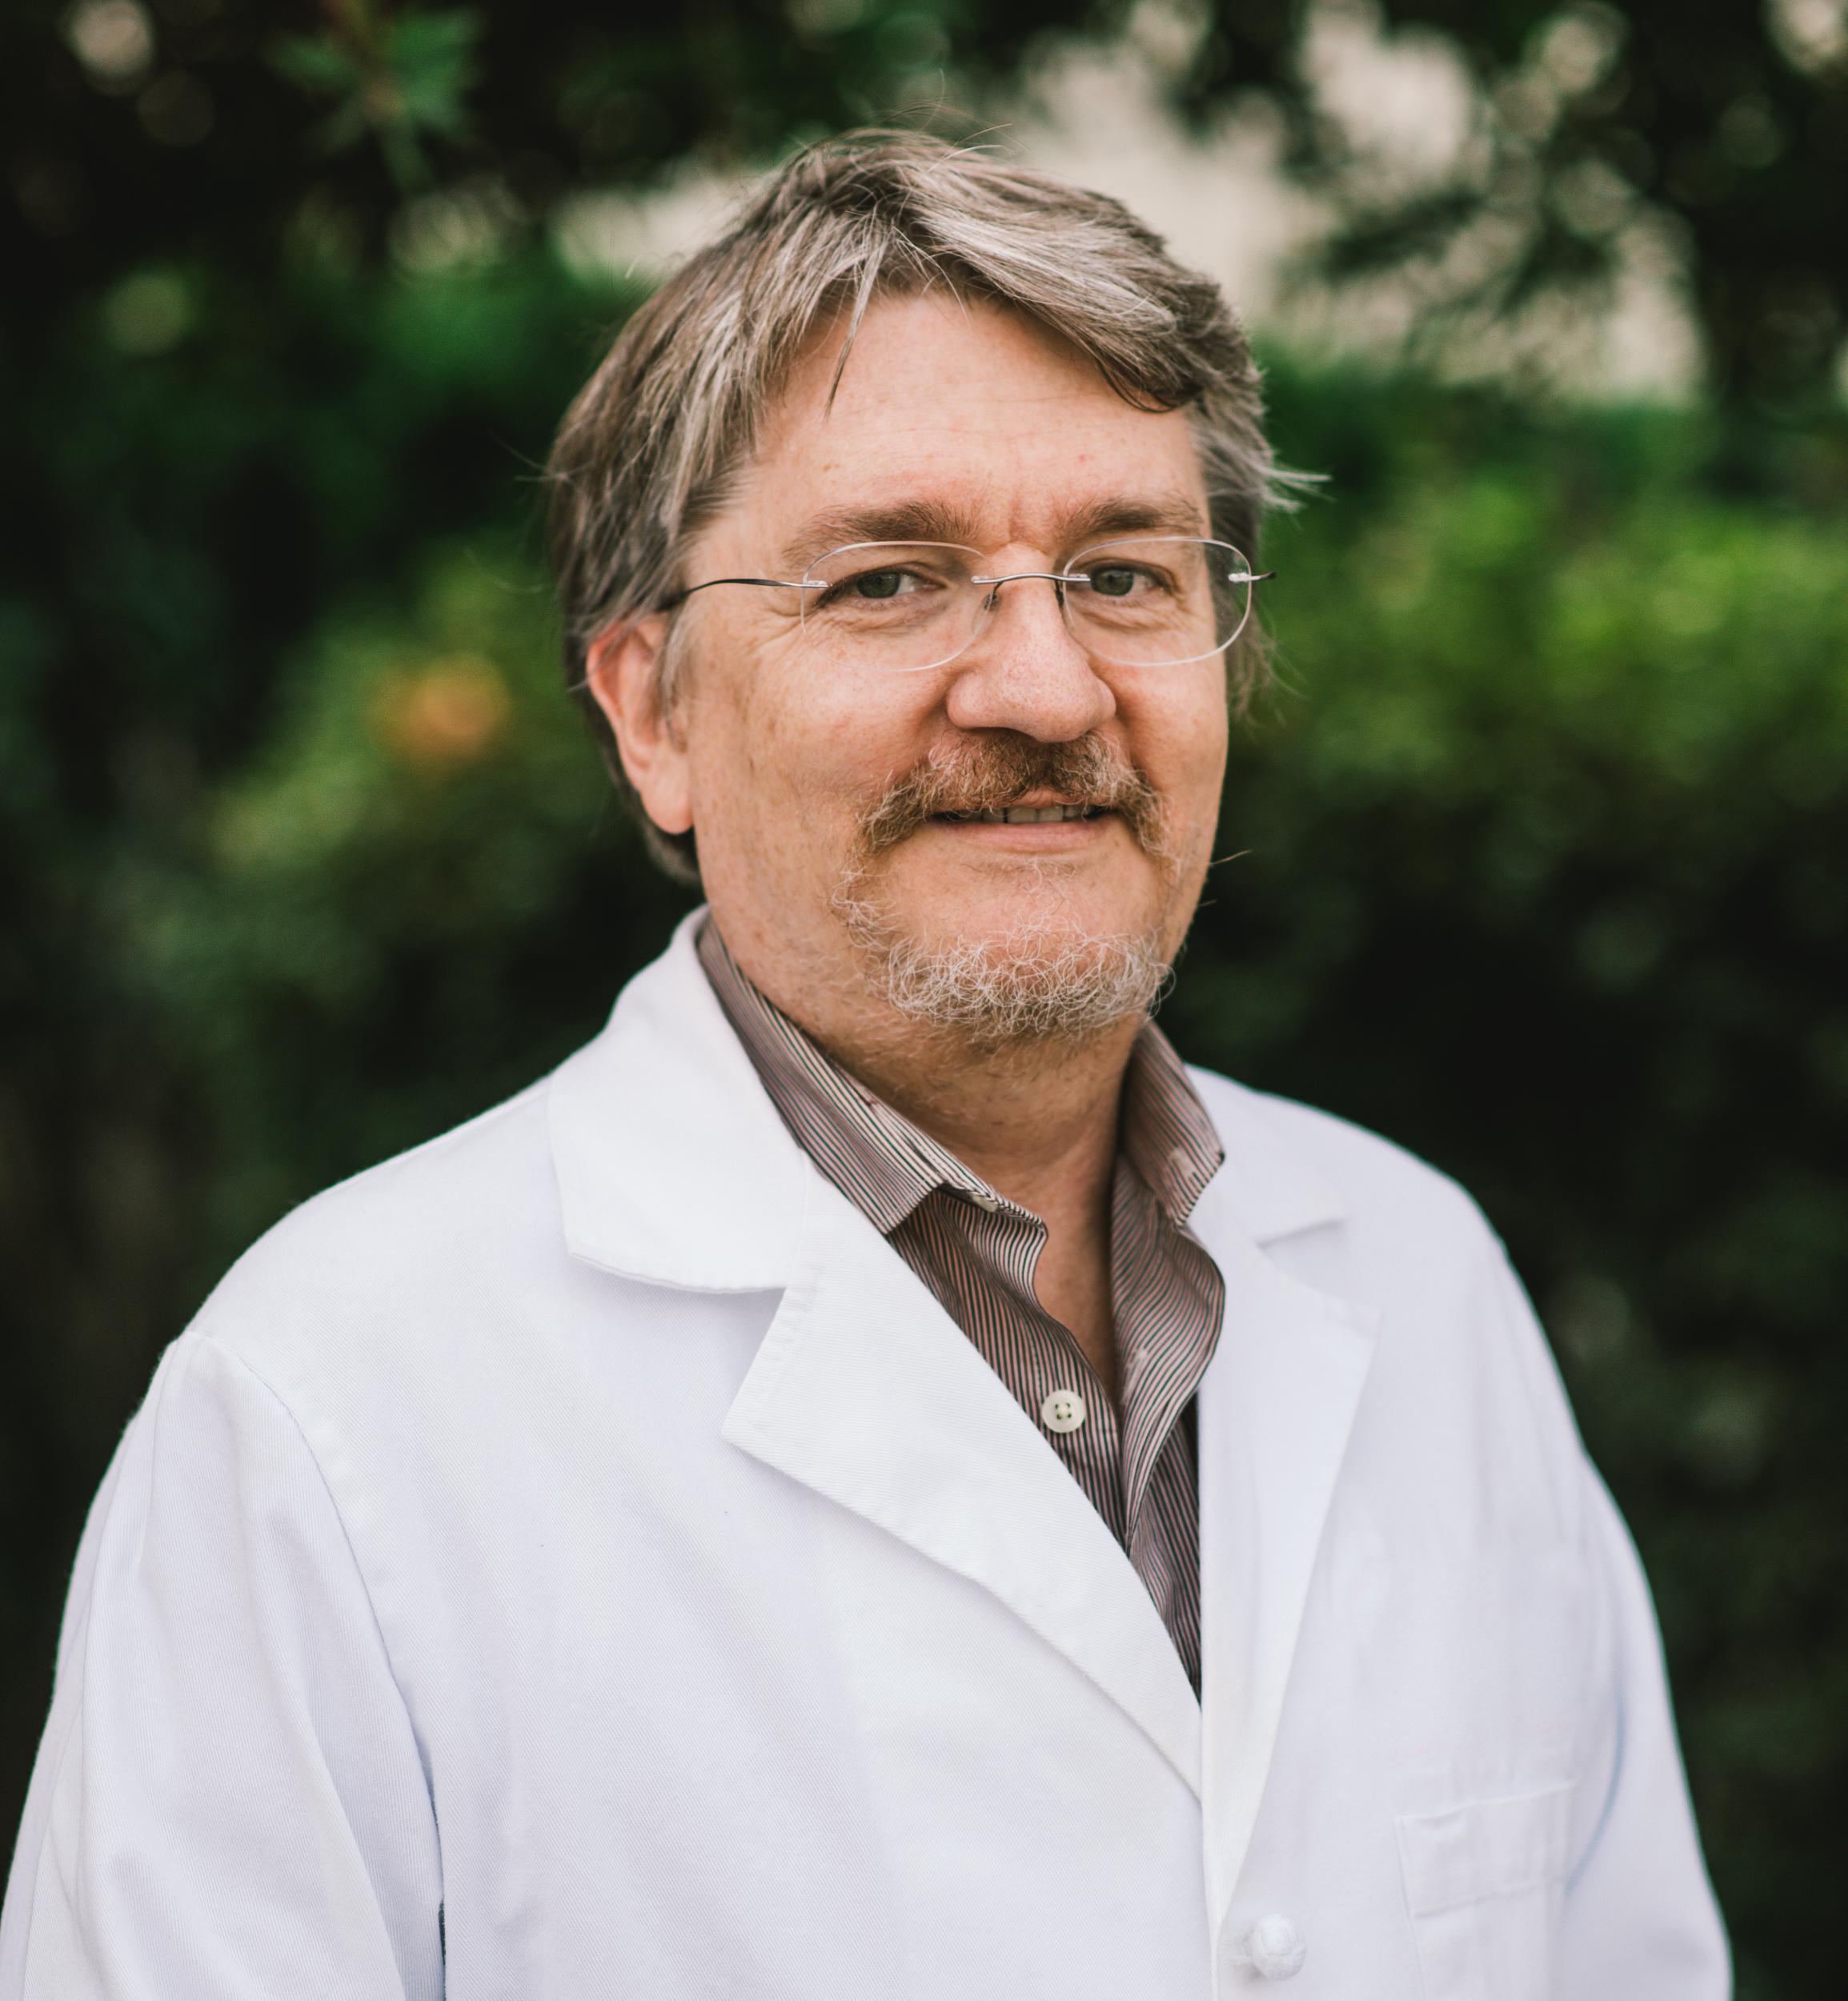 Joseph Mersol, body imaging radiology at bay imaging consultants